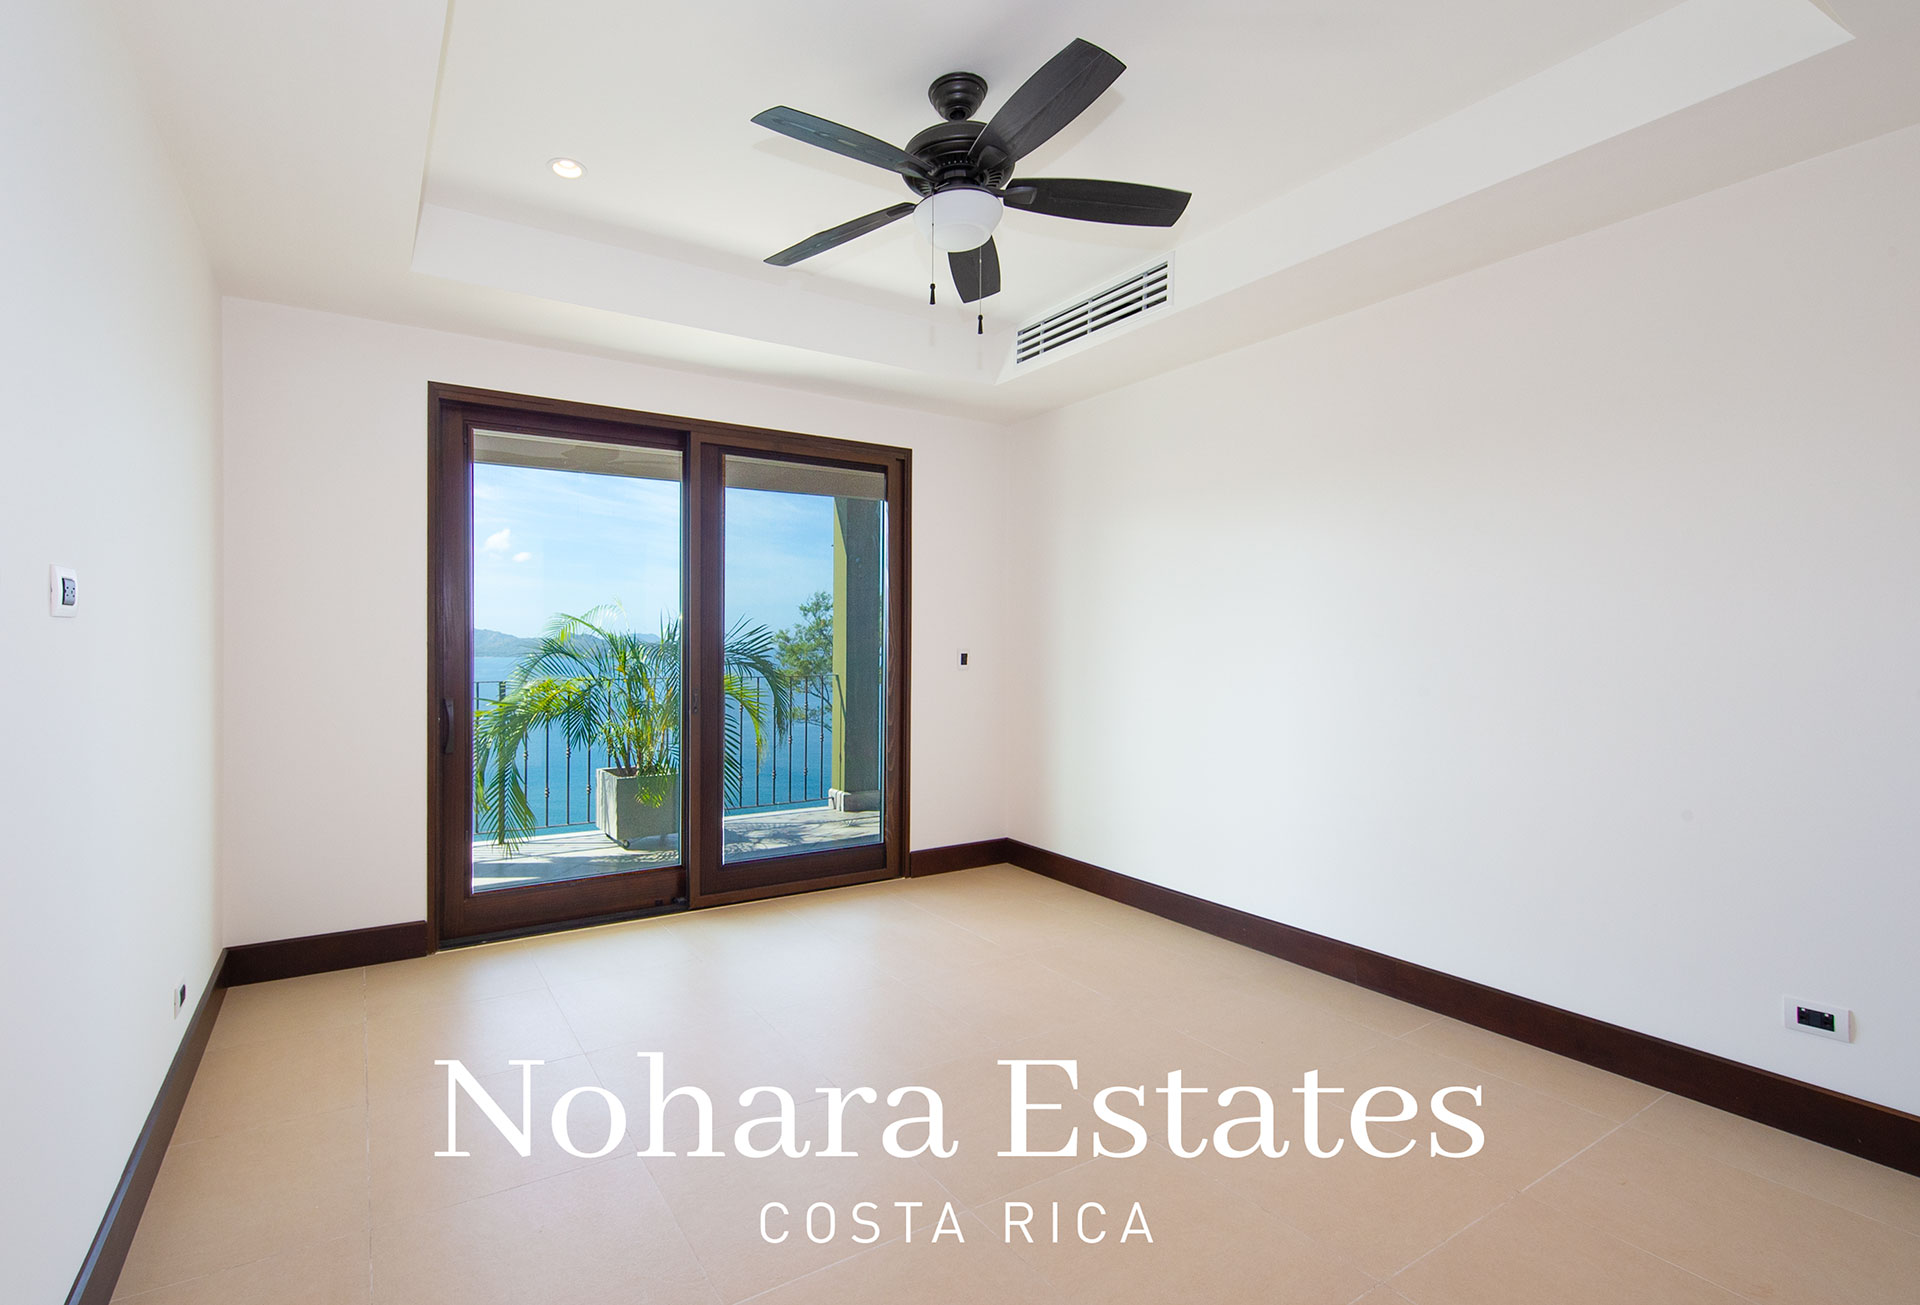 Nohara Estates Costa Rica 360 Esplendor Pacifico Playa Flamingo Penthouse 6